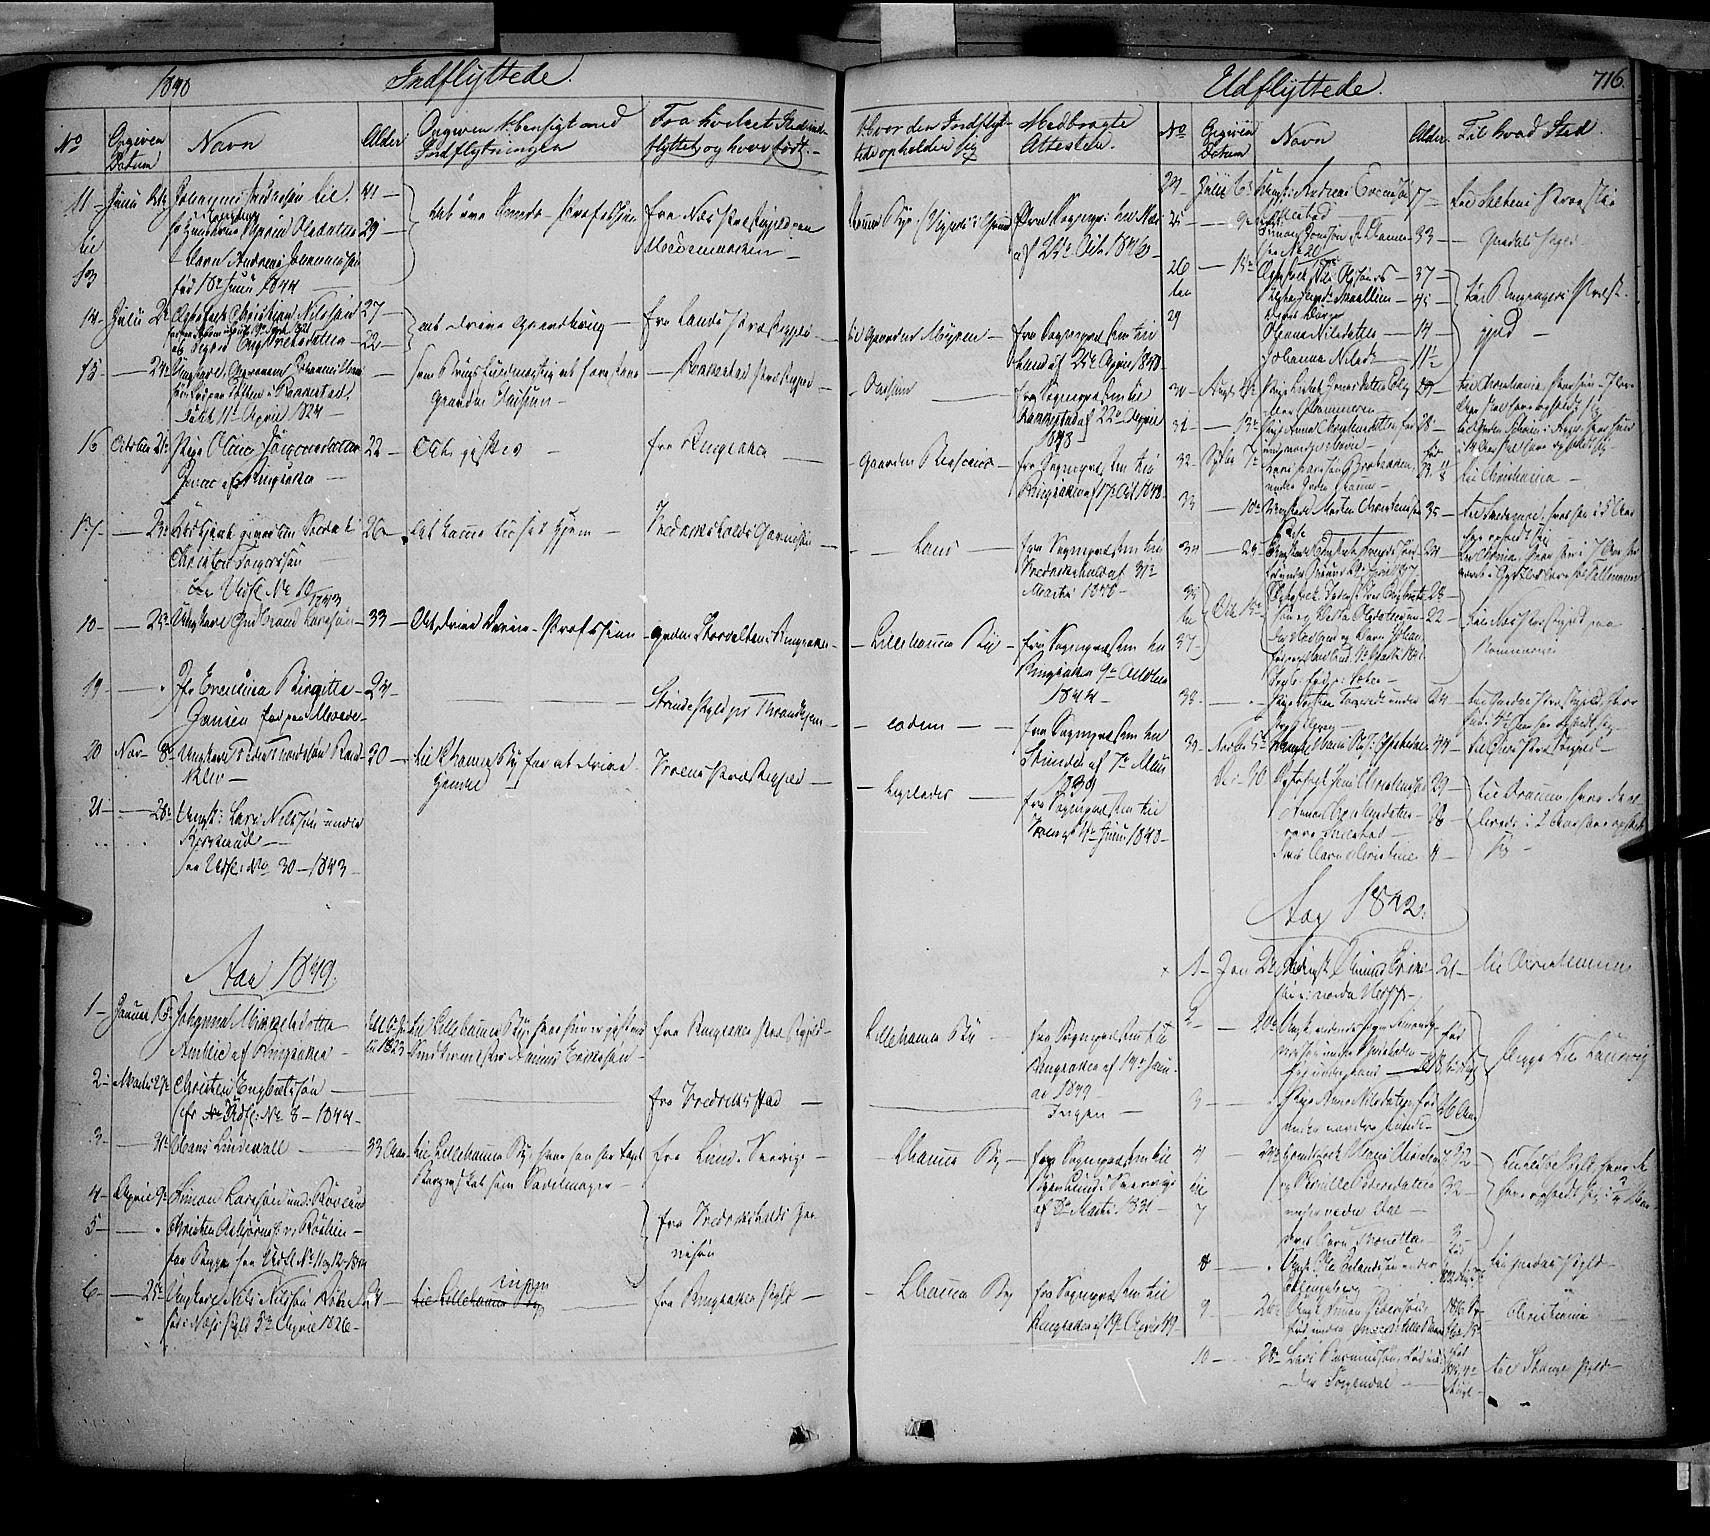 SAH, Fåberg prestekontor, Ministerialbok nr. 5, 1836-1854, s. 715-716